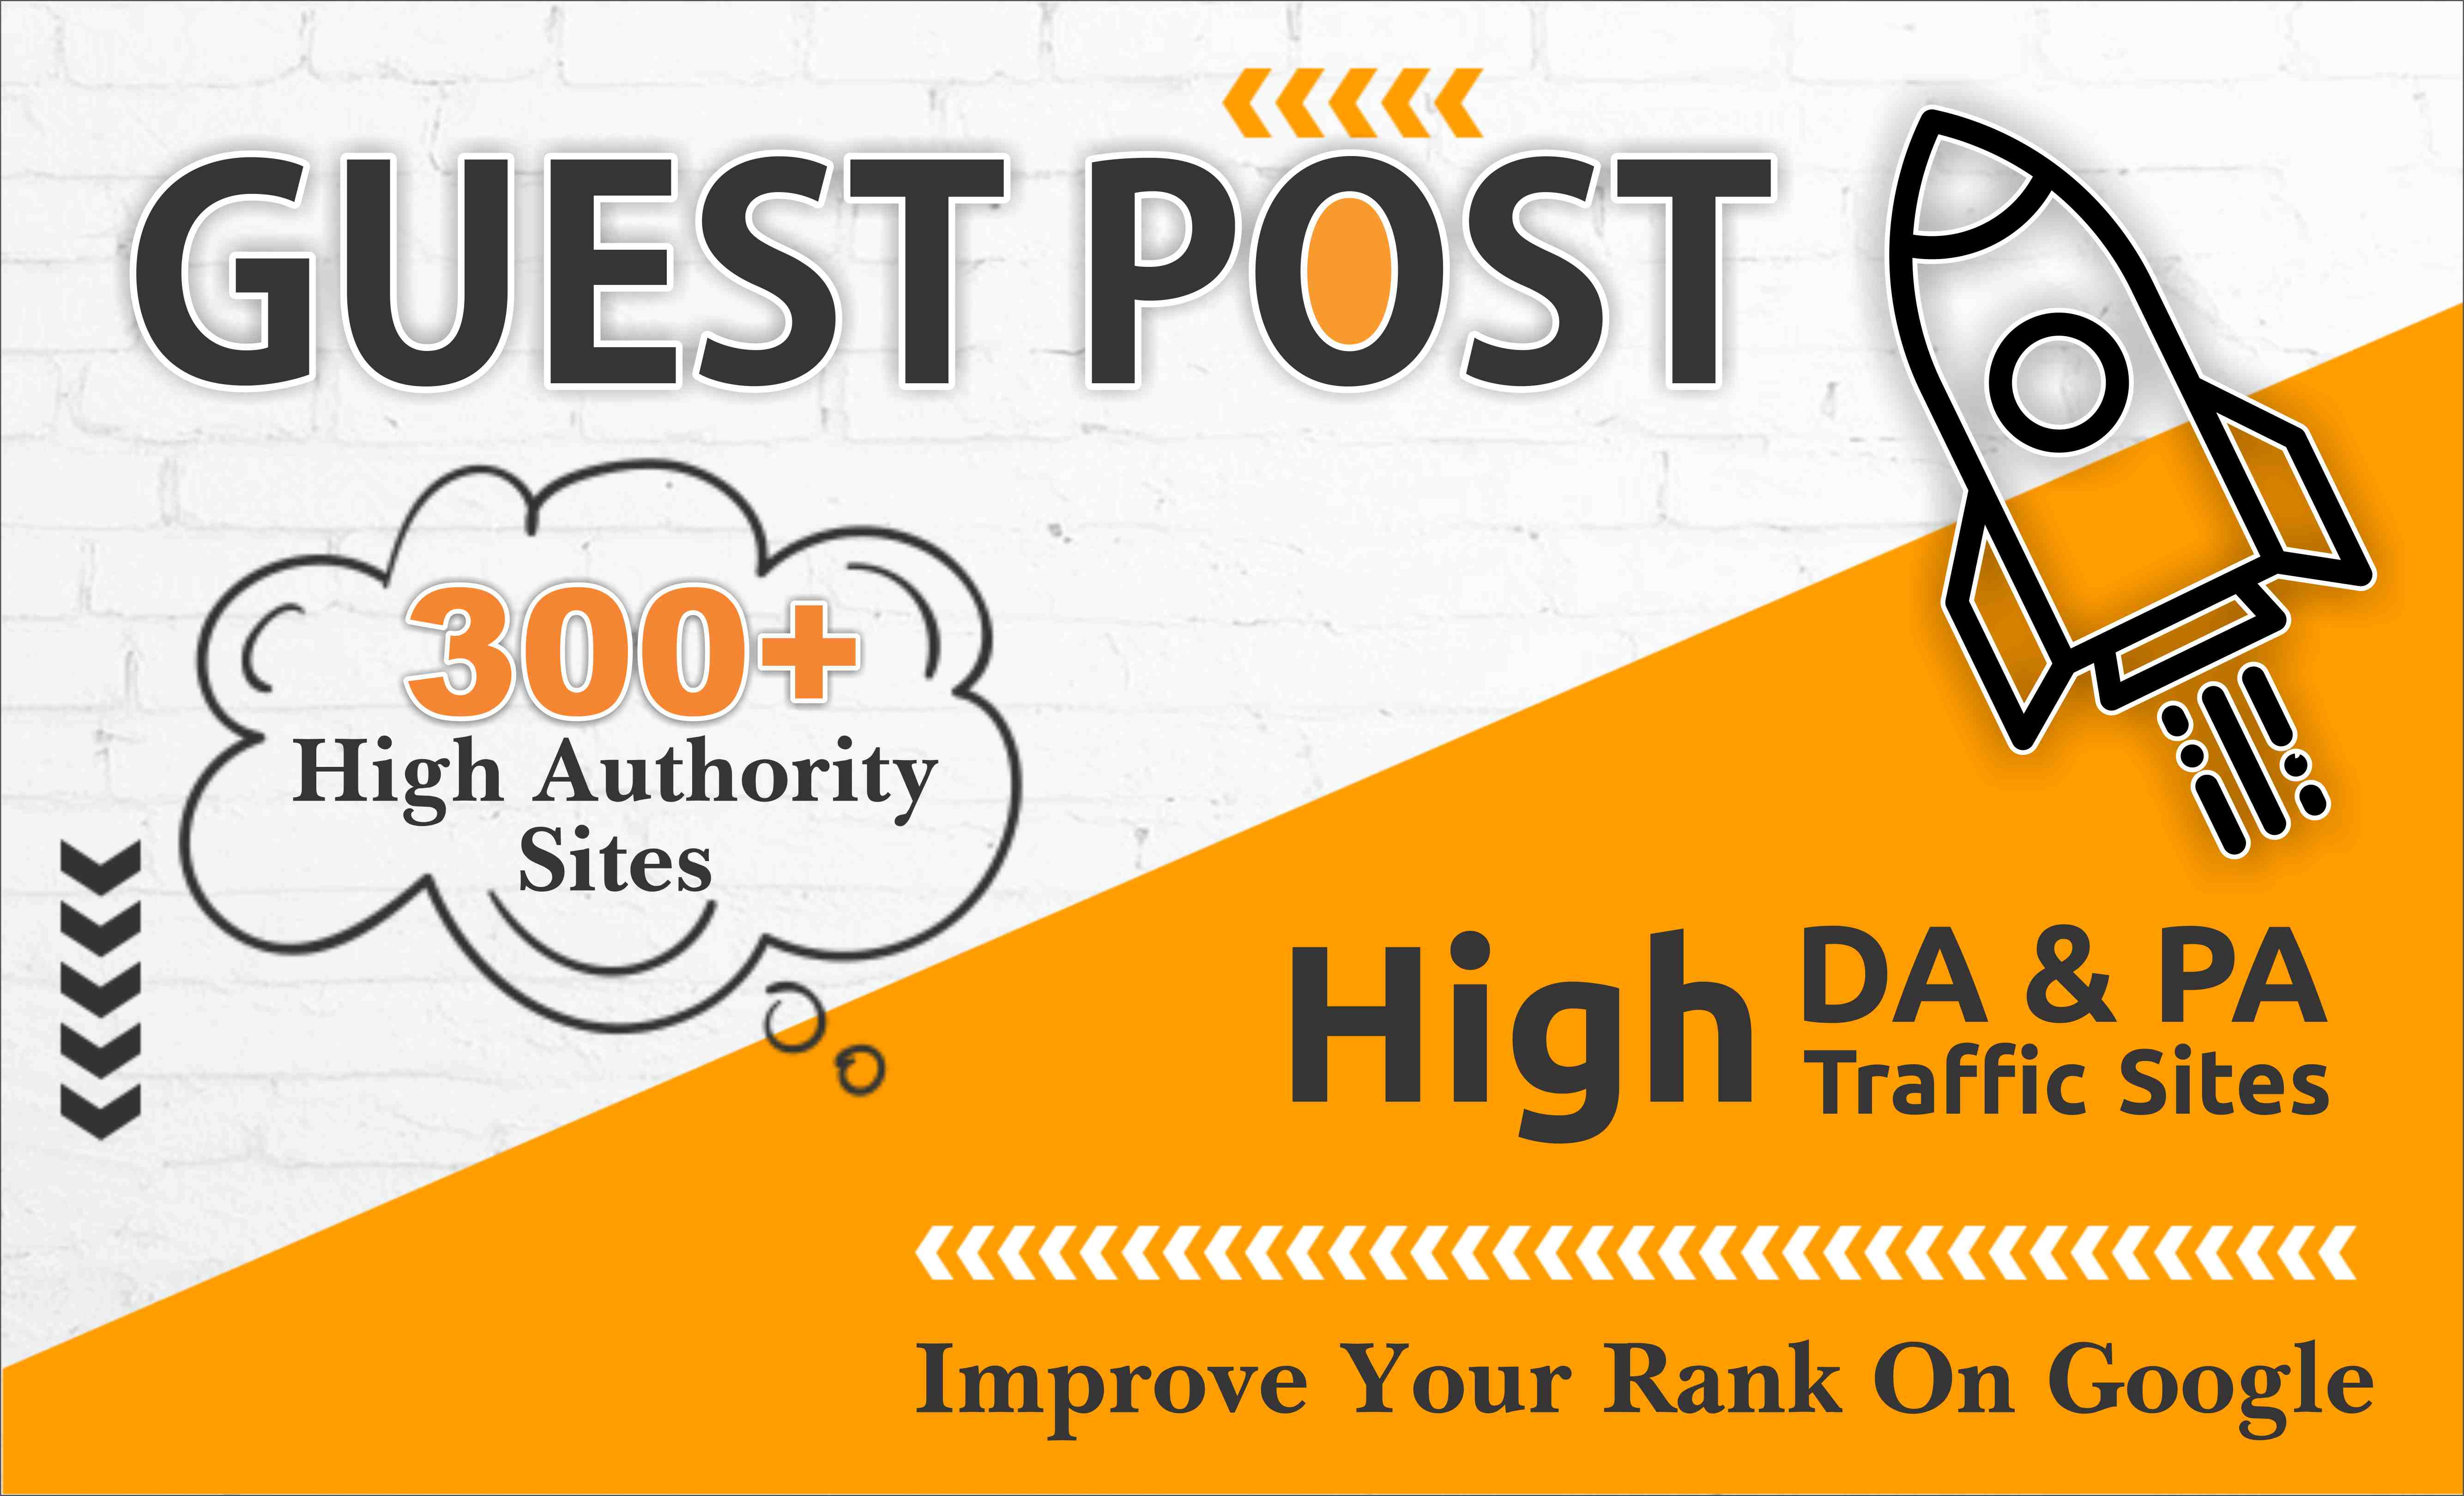 300 high quality guest posts dofollow link high da sites